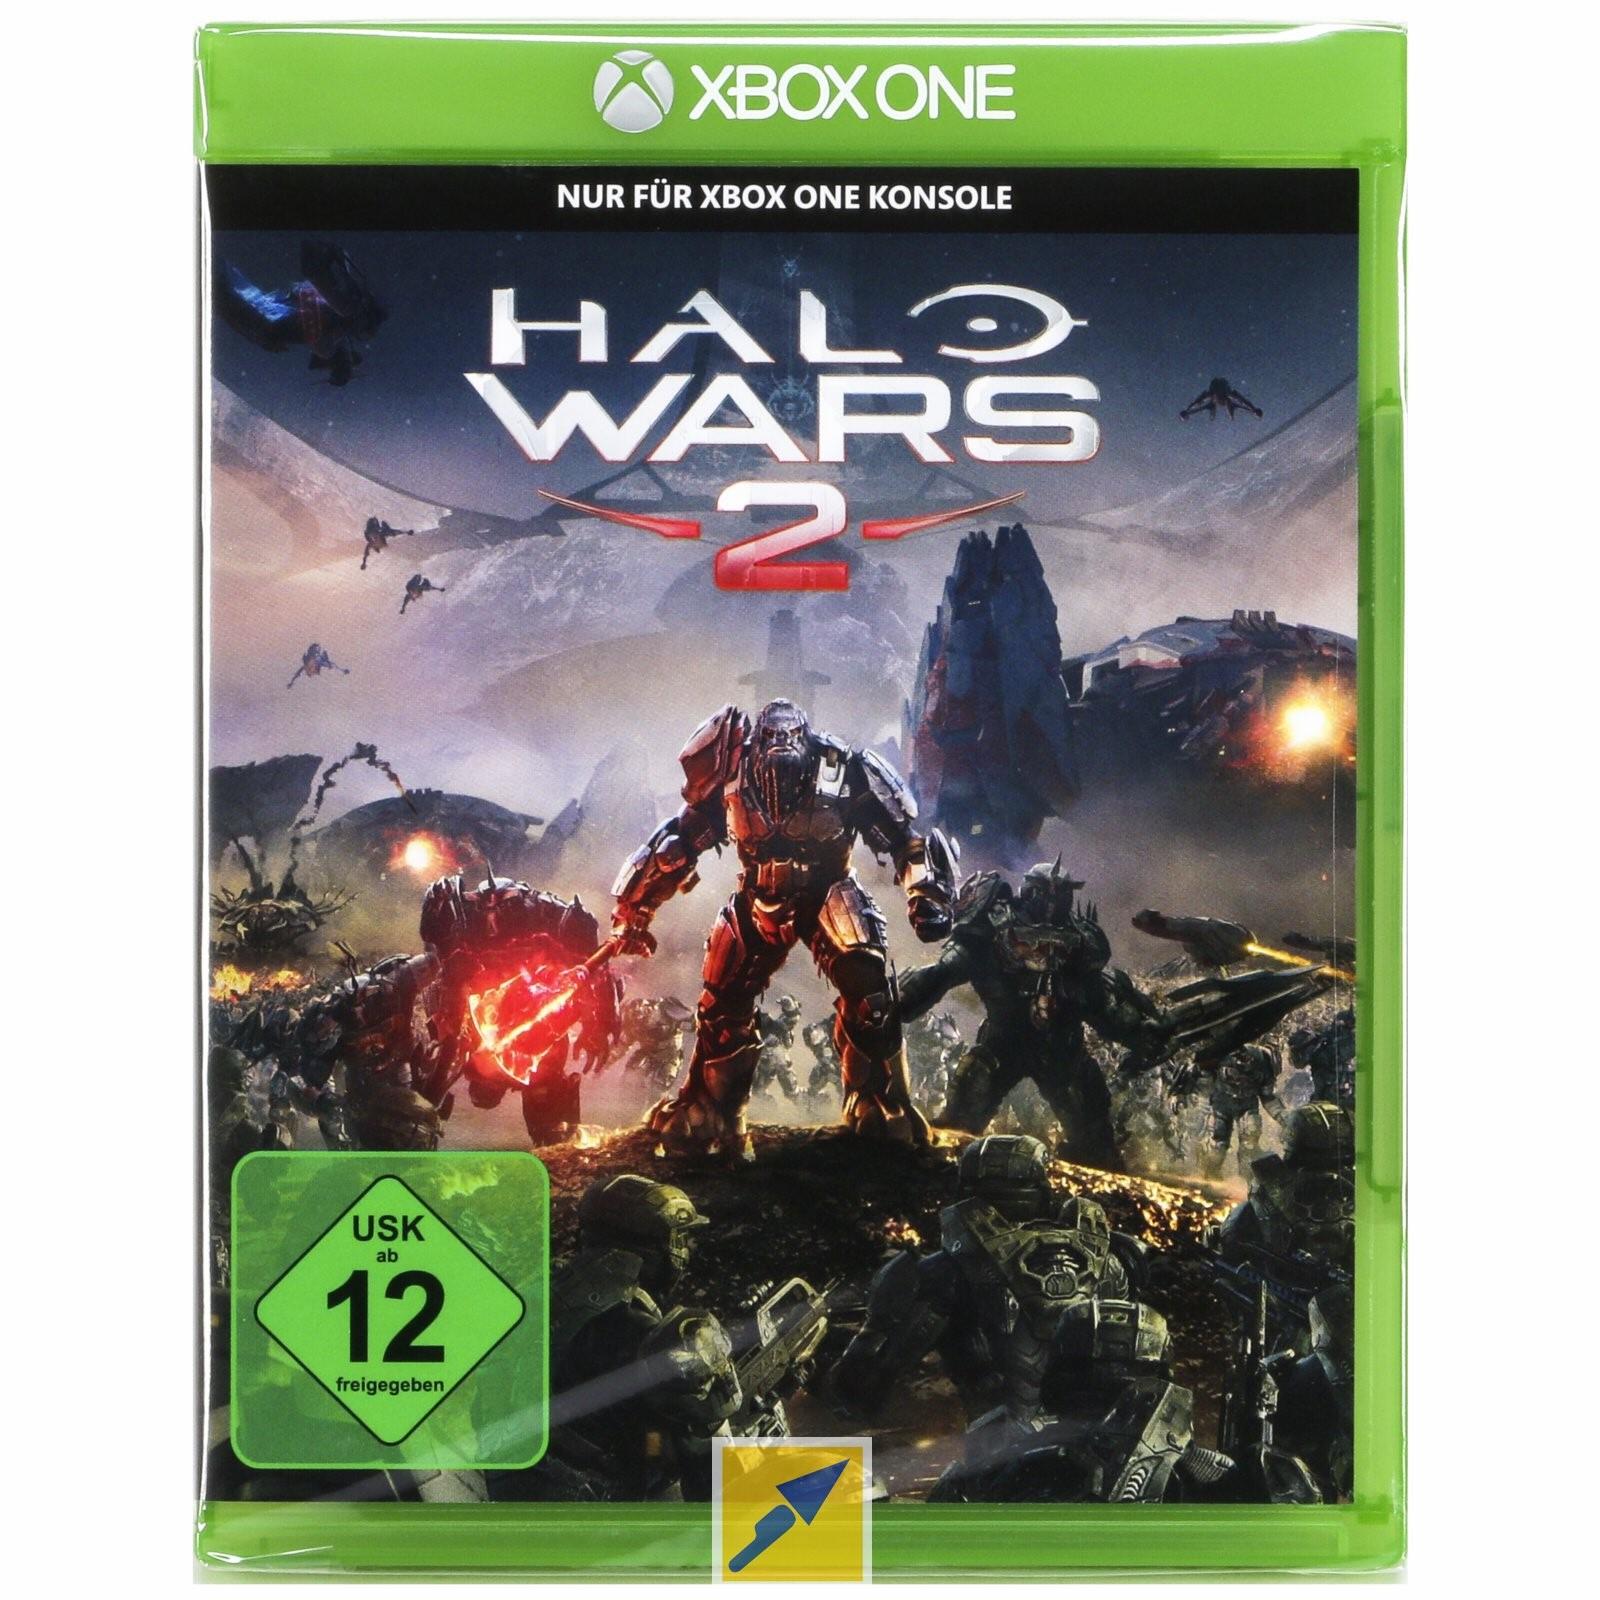 Halo Wars 2 (Xbox One) für 12,69€ (Amazon.it Prime)